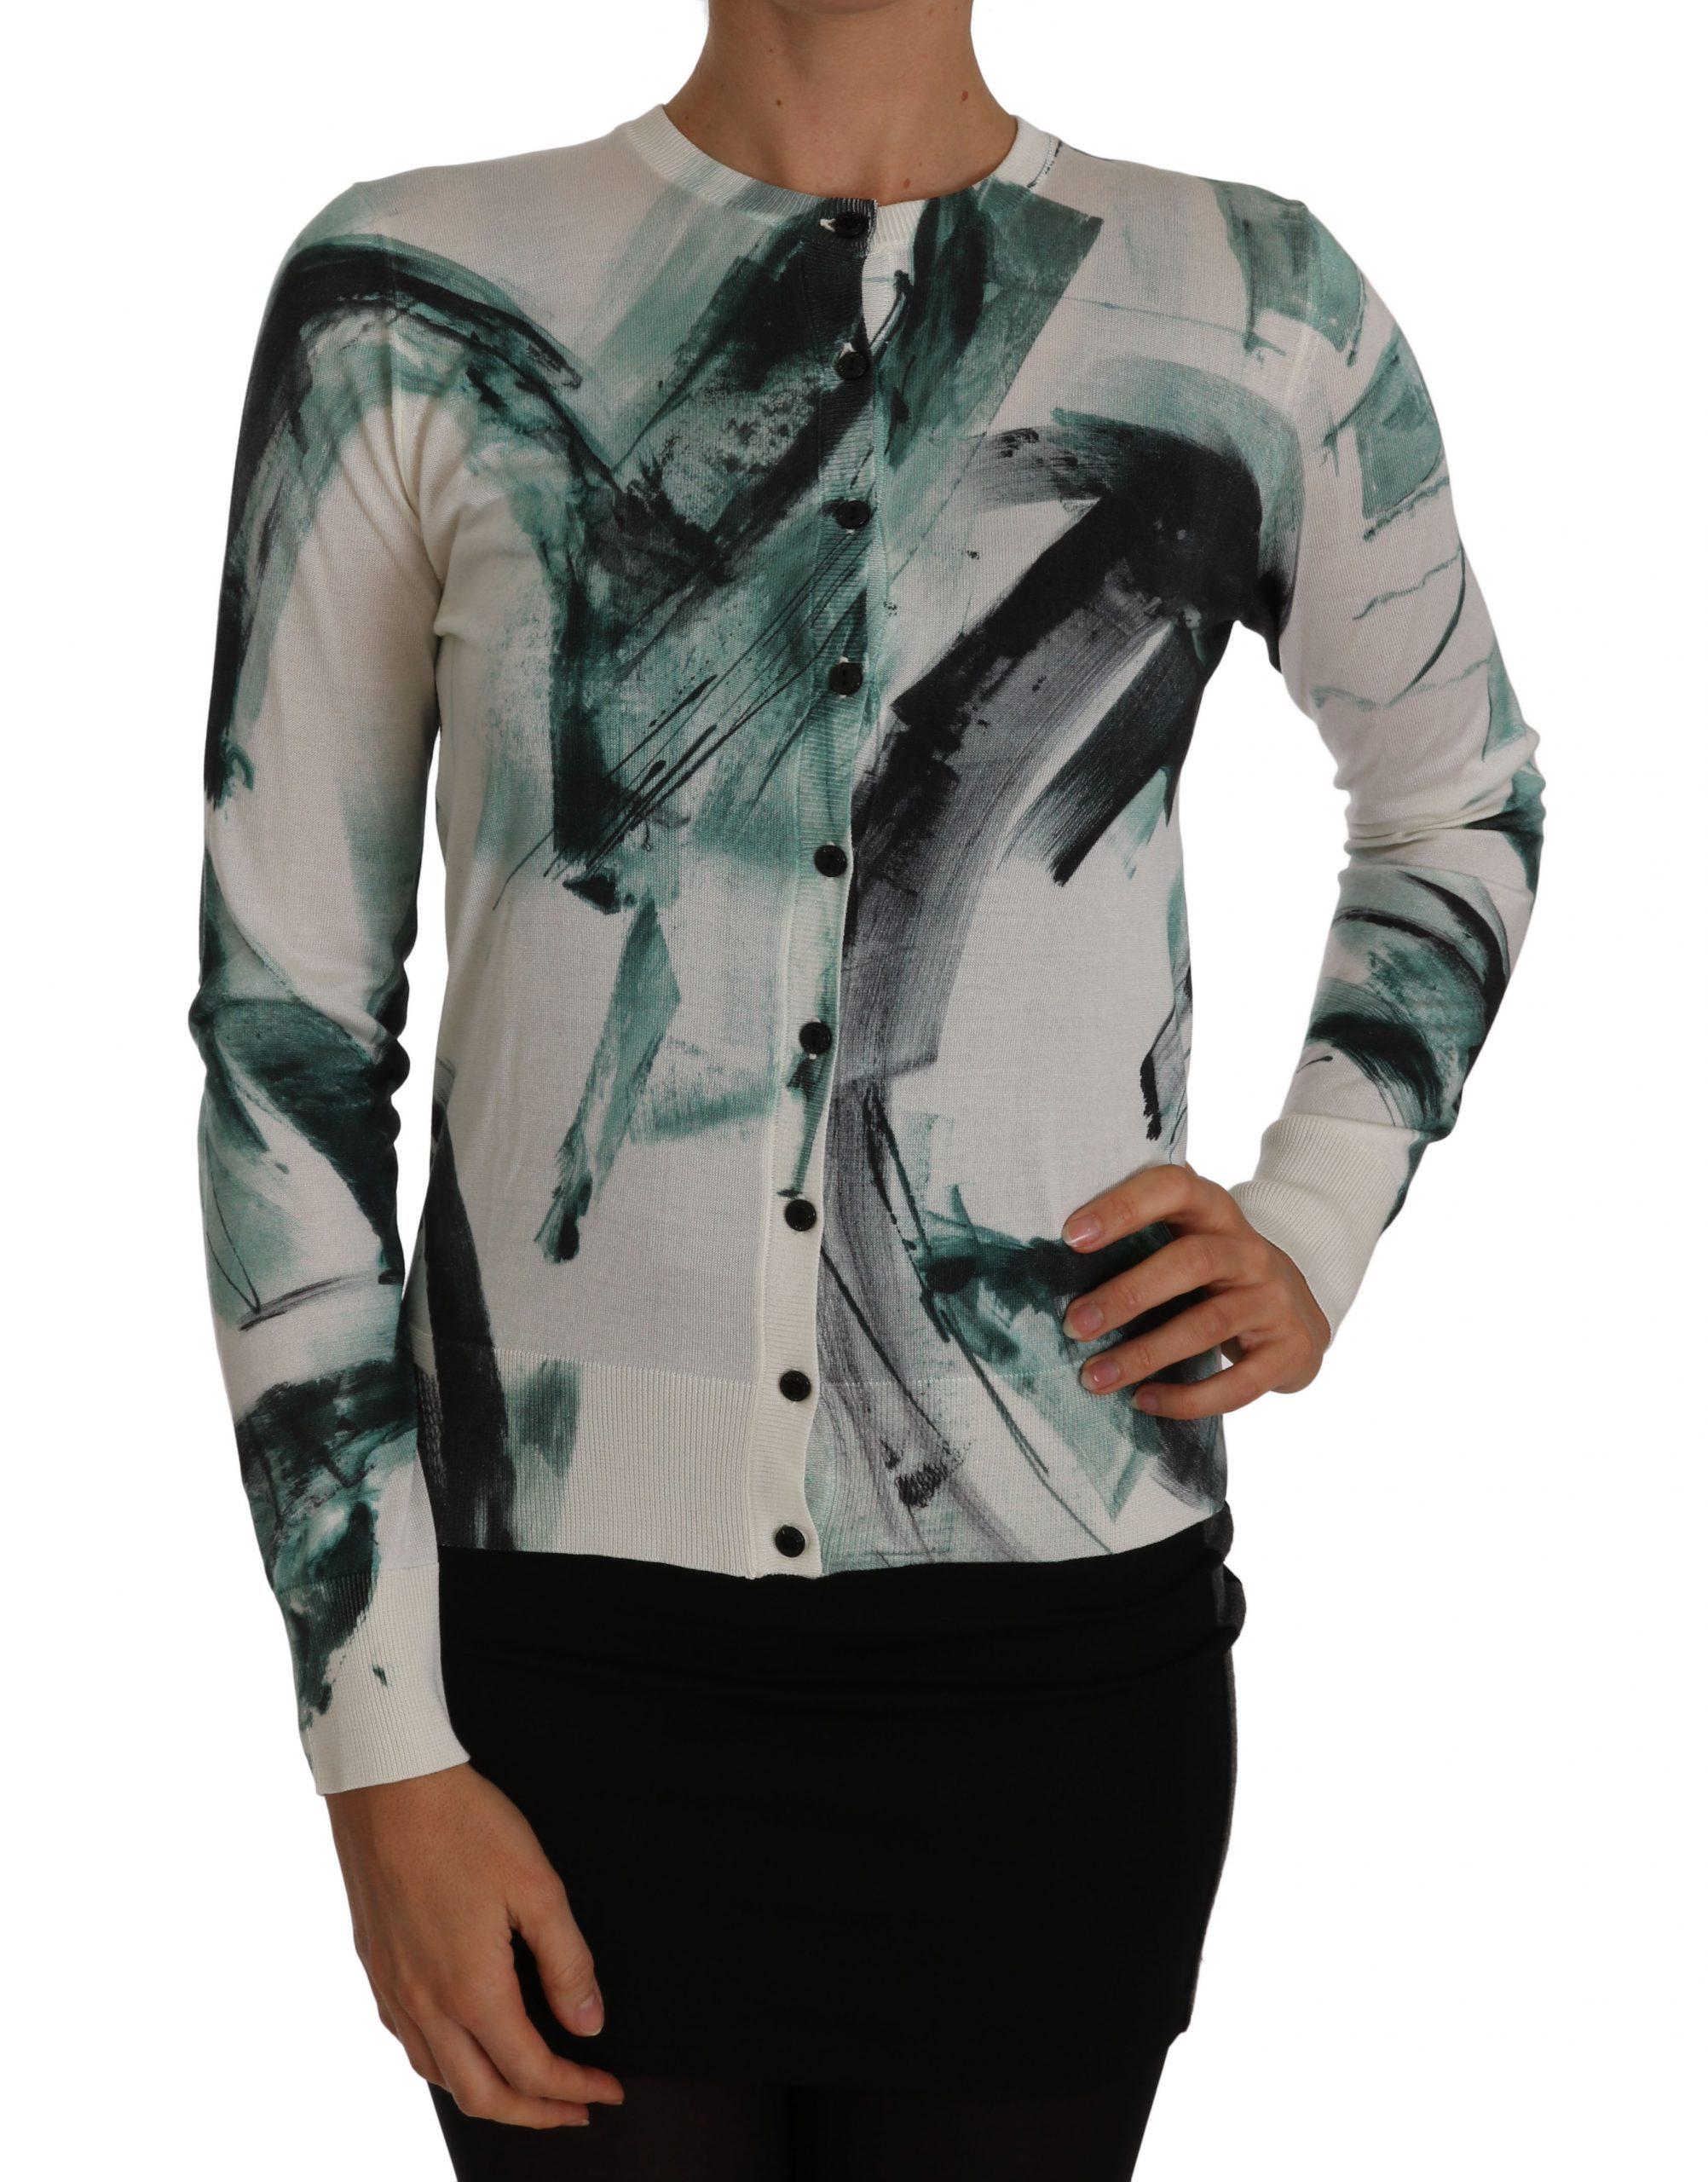 Dolce & Gabbana Women's Slk Lightweight Paint Stroke Cardigan White TSH2441 - IT36 | XS